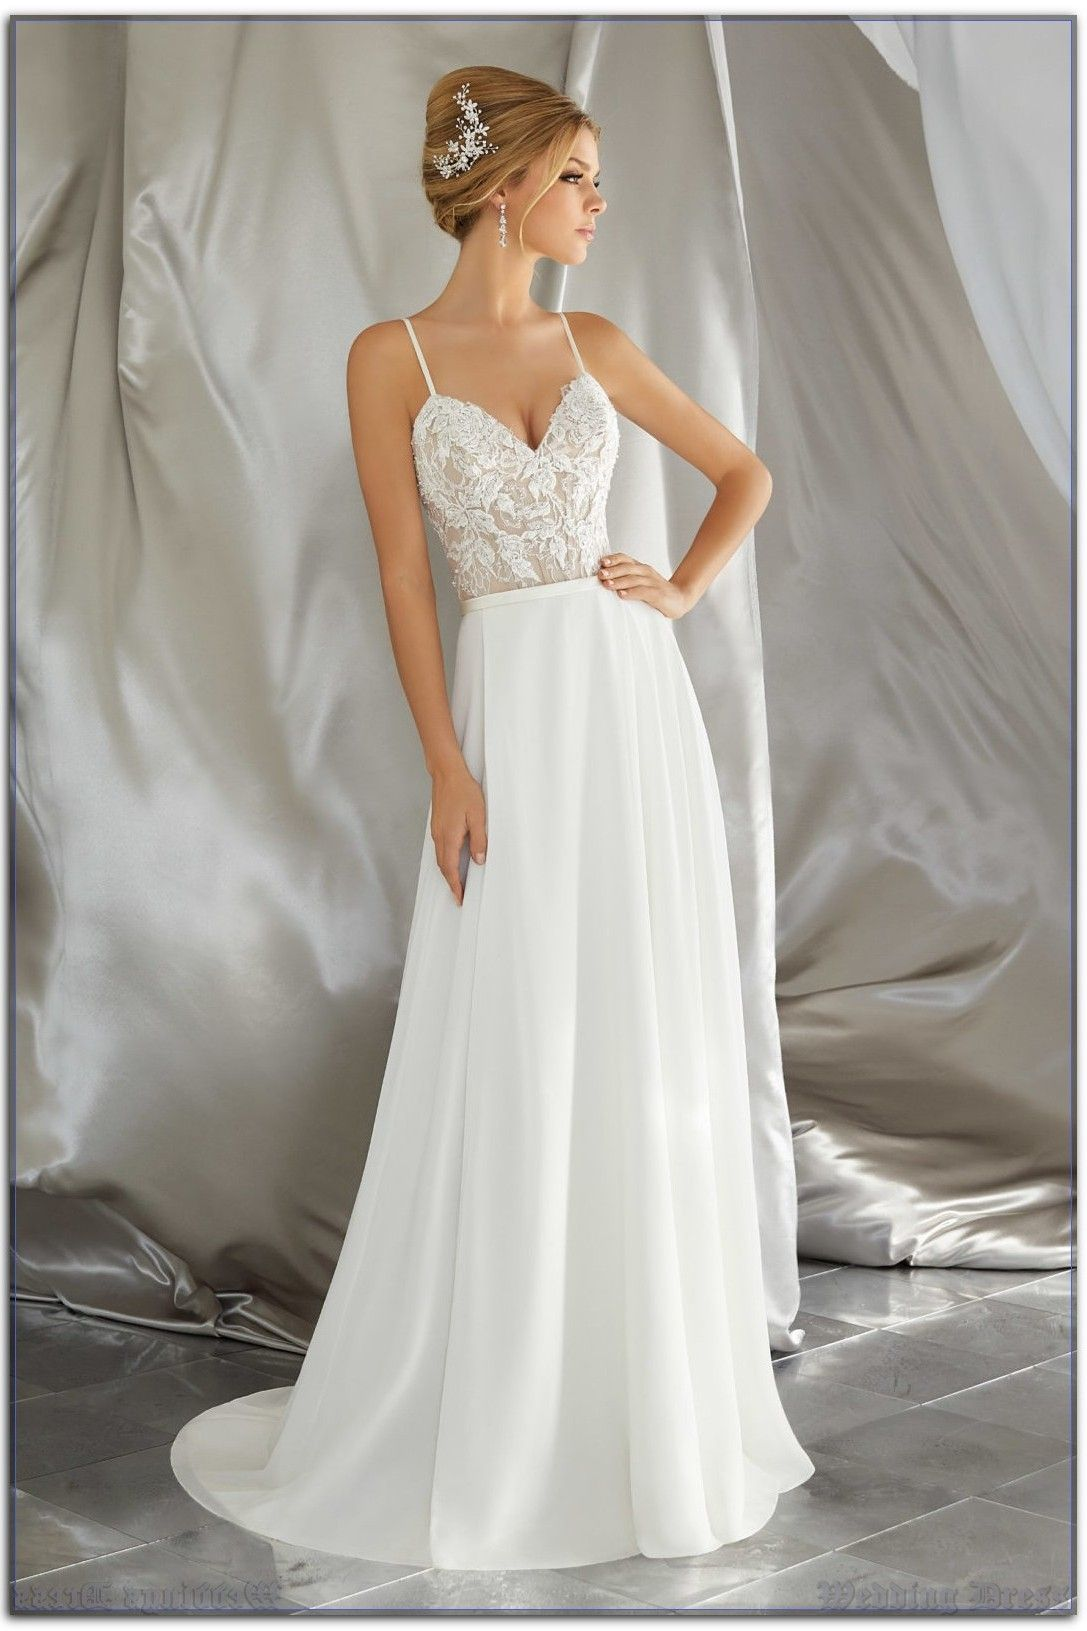 Top 3 Ways To Buy A Used Weddings Dress